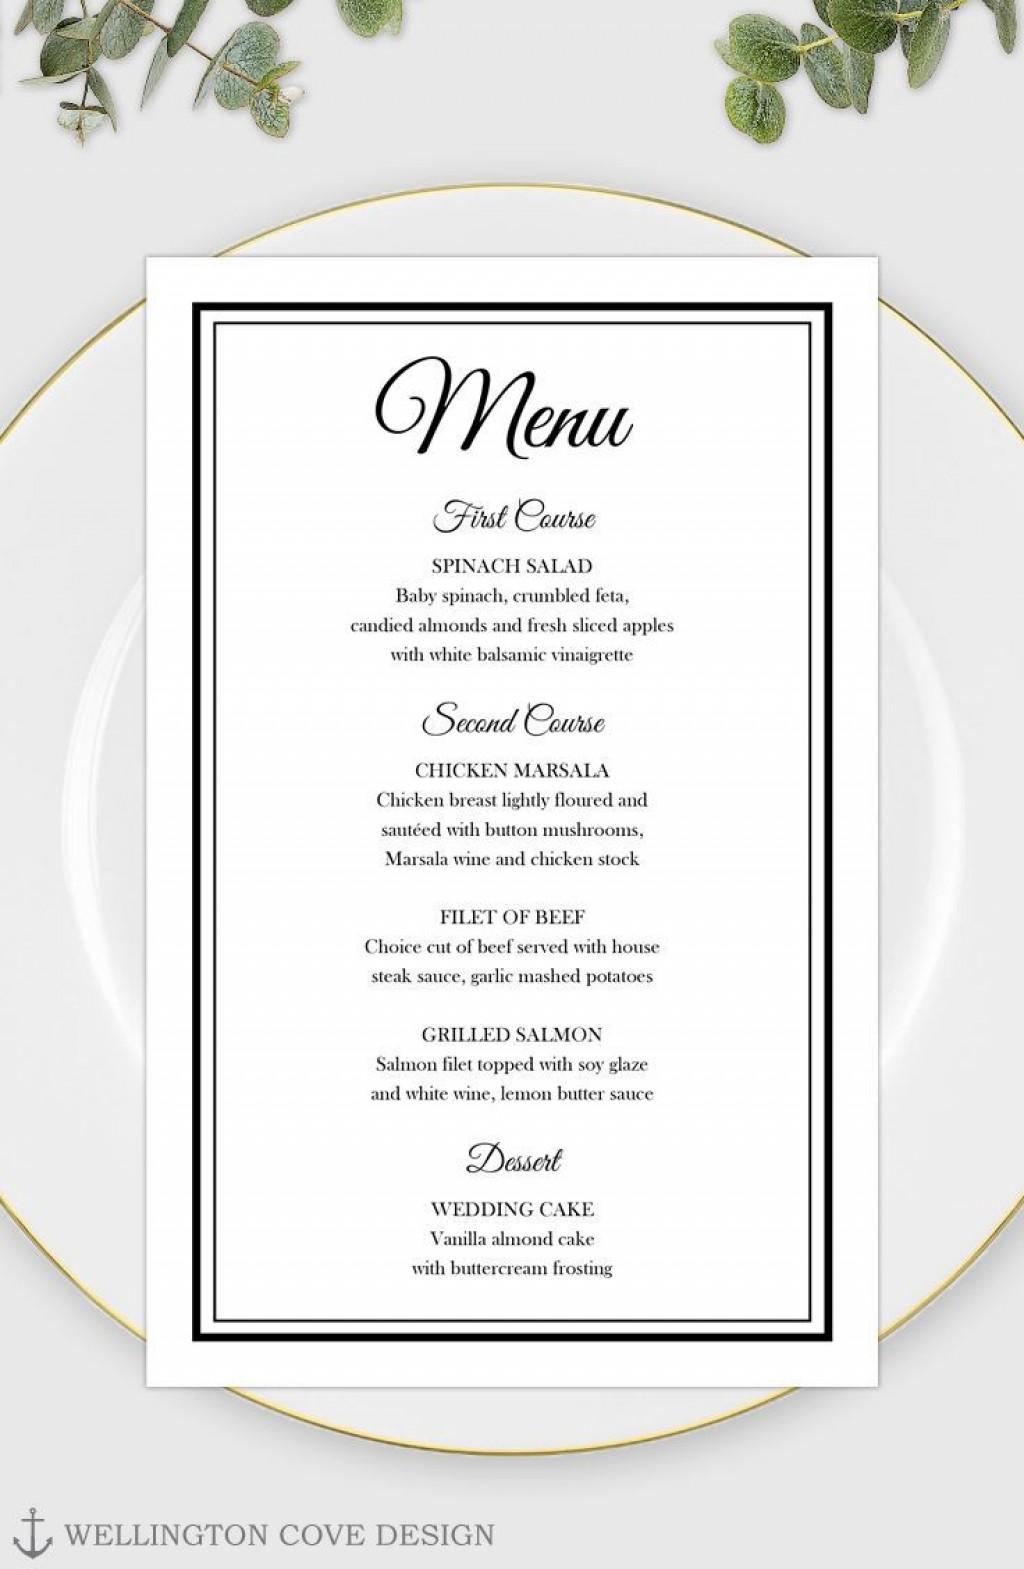 002 Best Menu Card Template Free Download High Resolution  Indian Restaurant Design CafeLarge